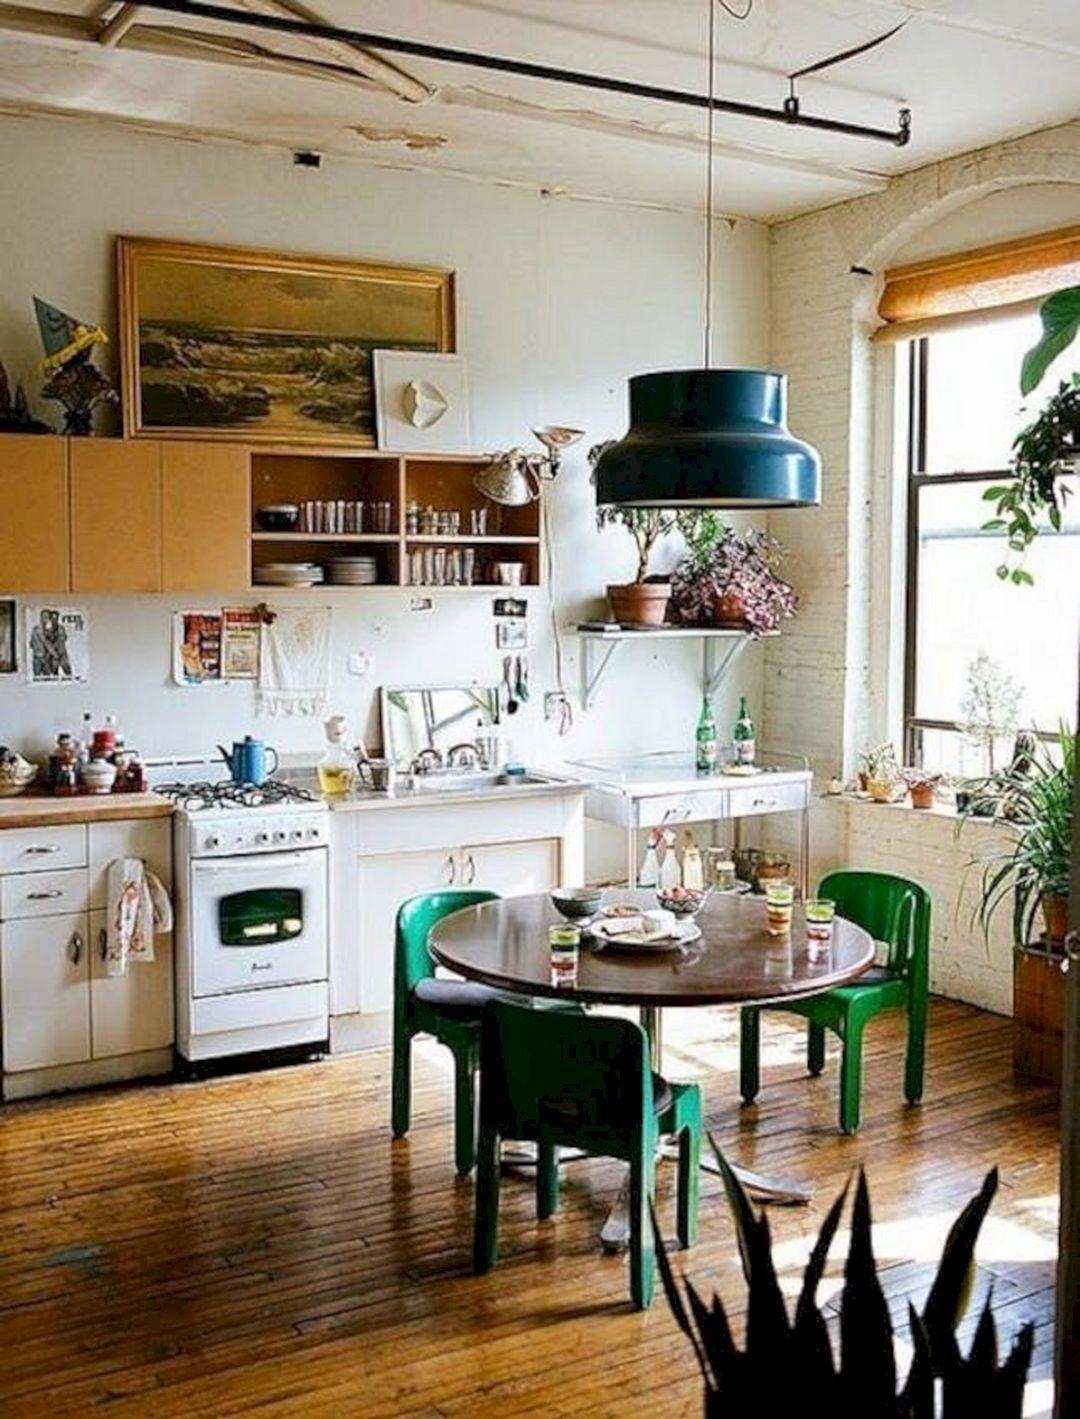 Astounding 20+ Most Beautiful Bohemian Kitchen Decor for Cozy ...